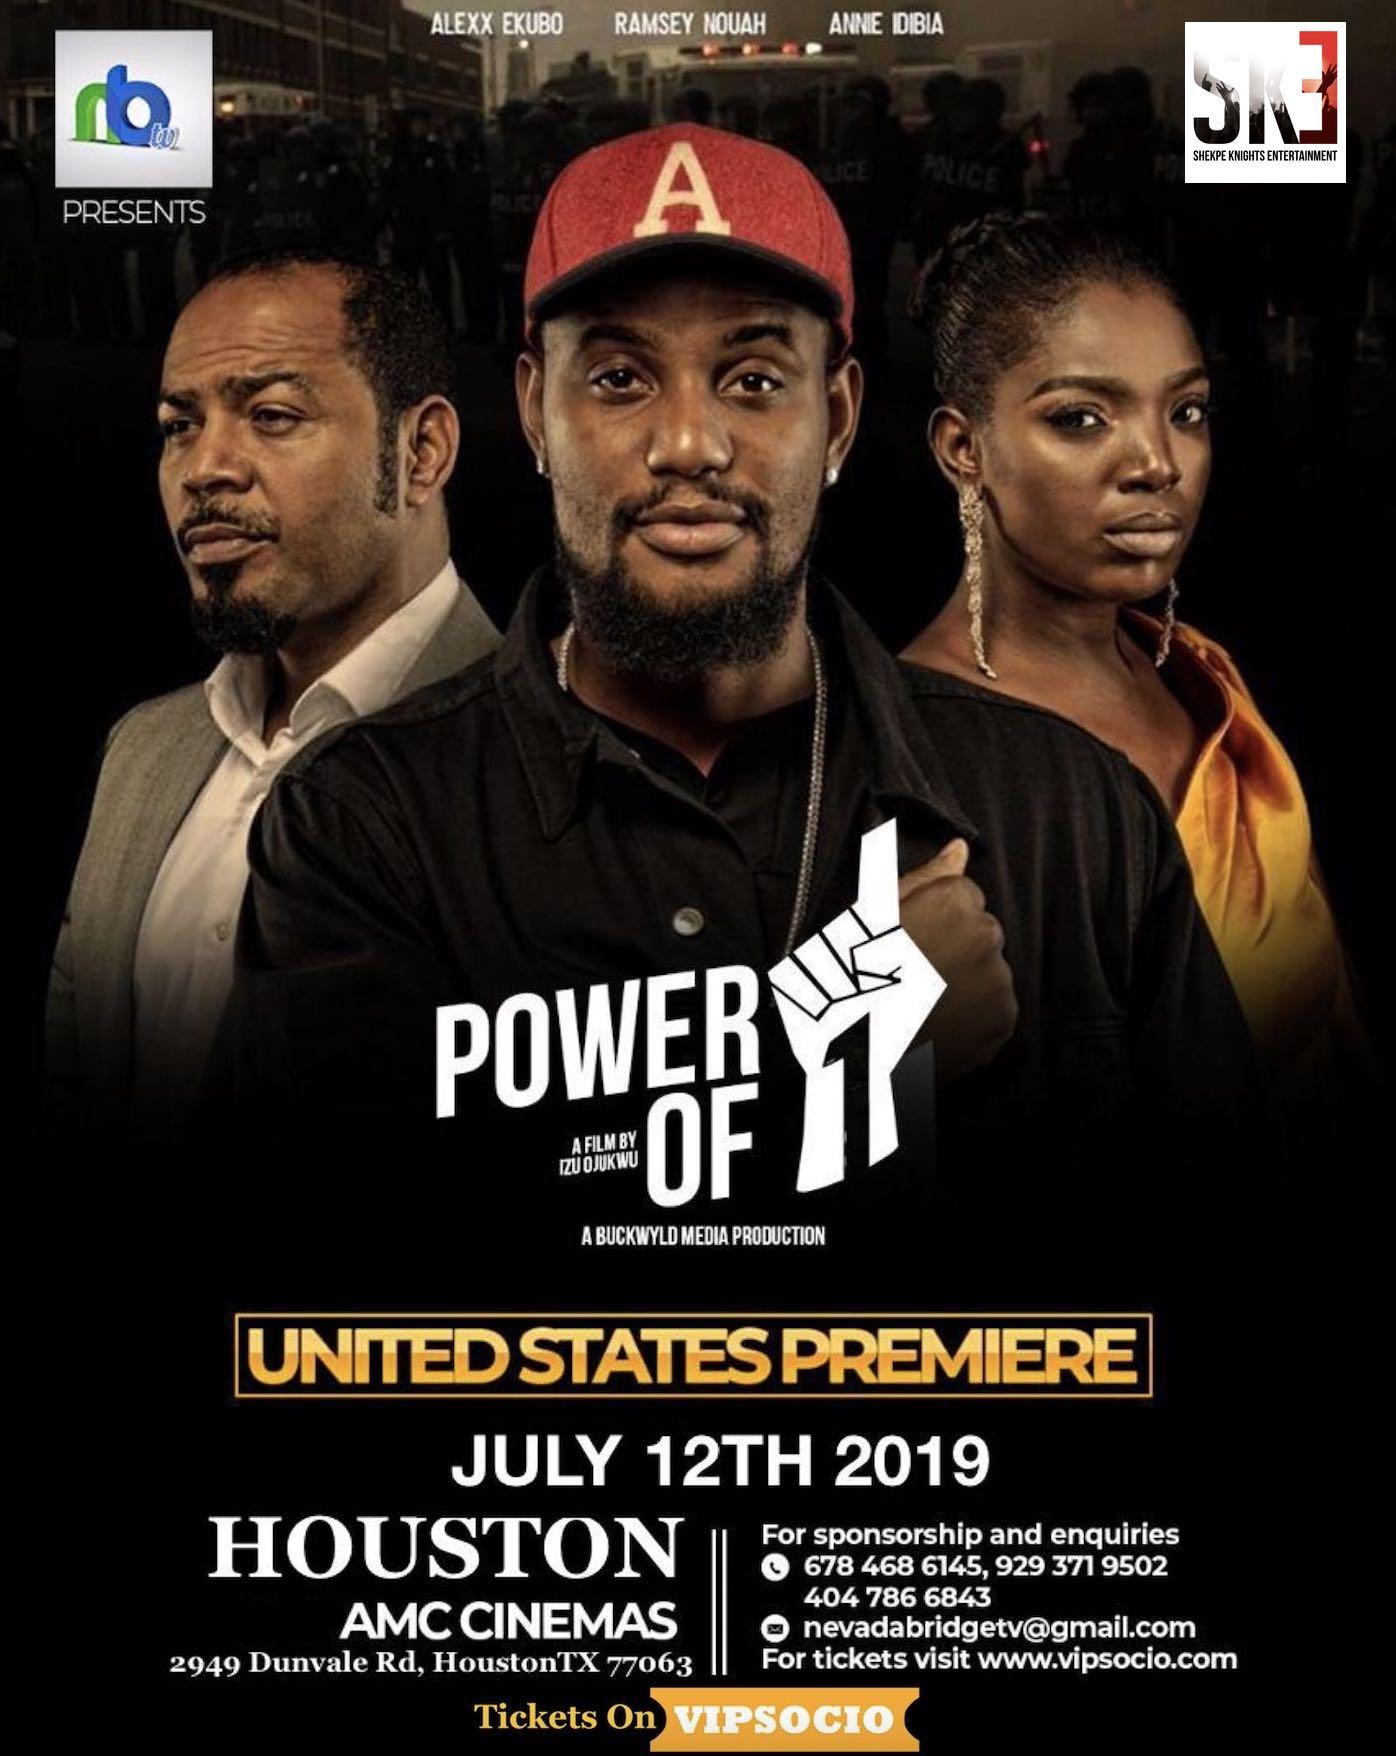 POWER OF 1 Movie Premiere